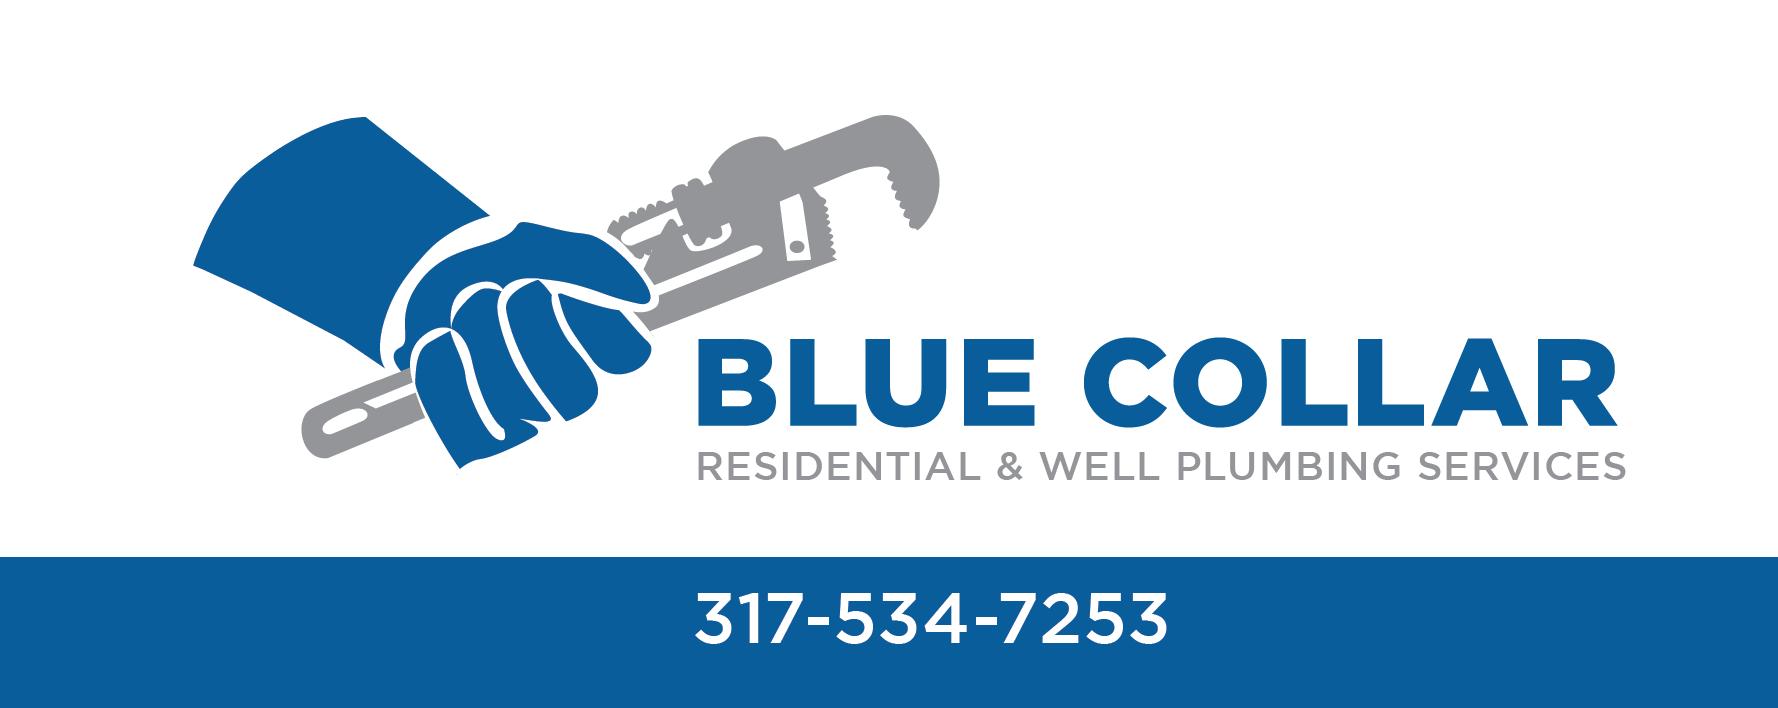 Facebook Cover Photo of Blue Collar Plumbing Brand